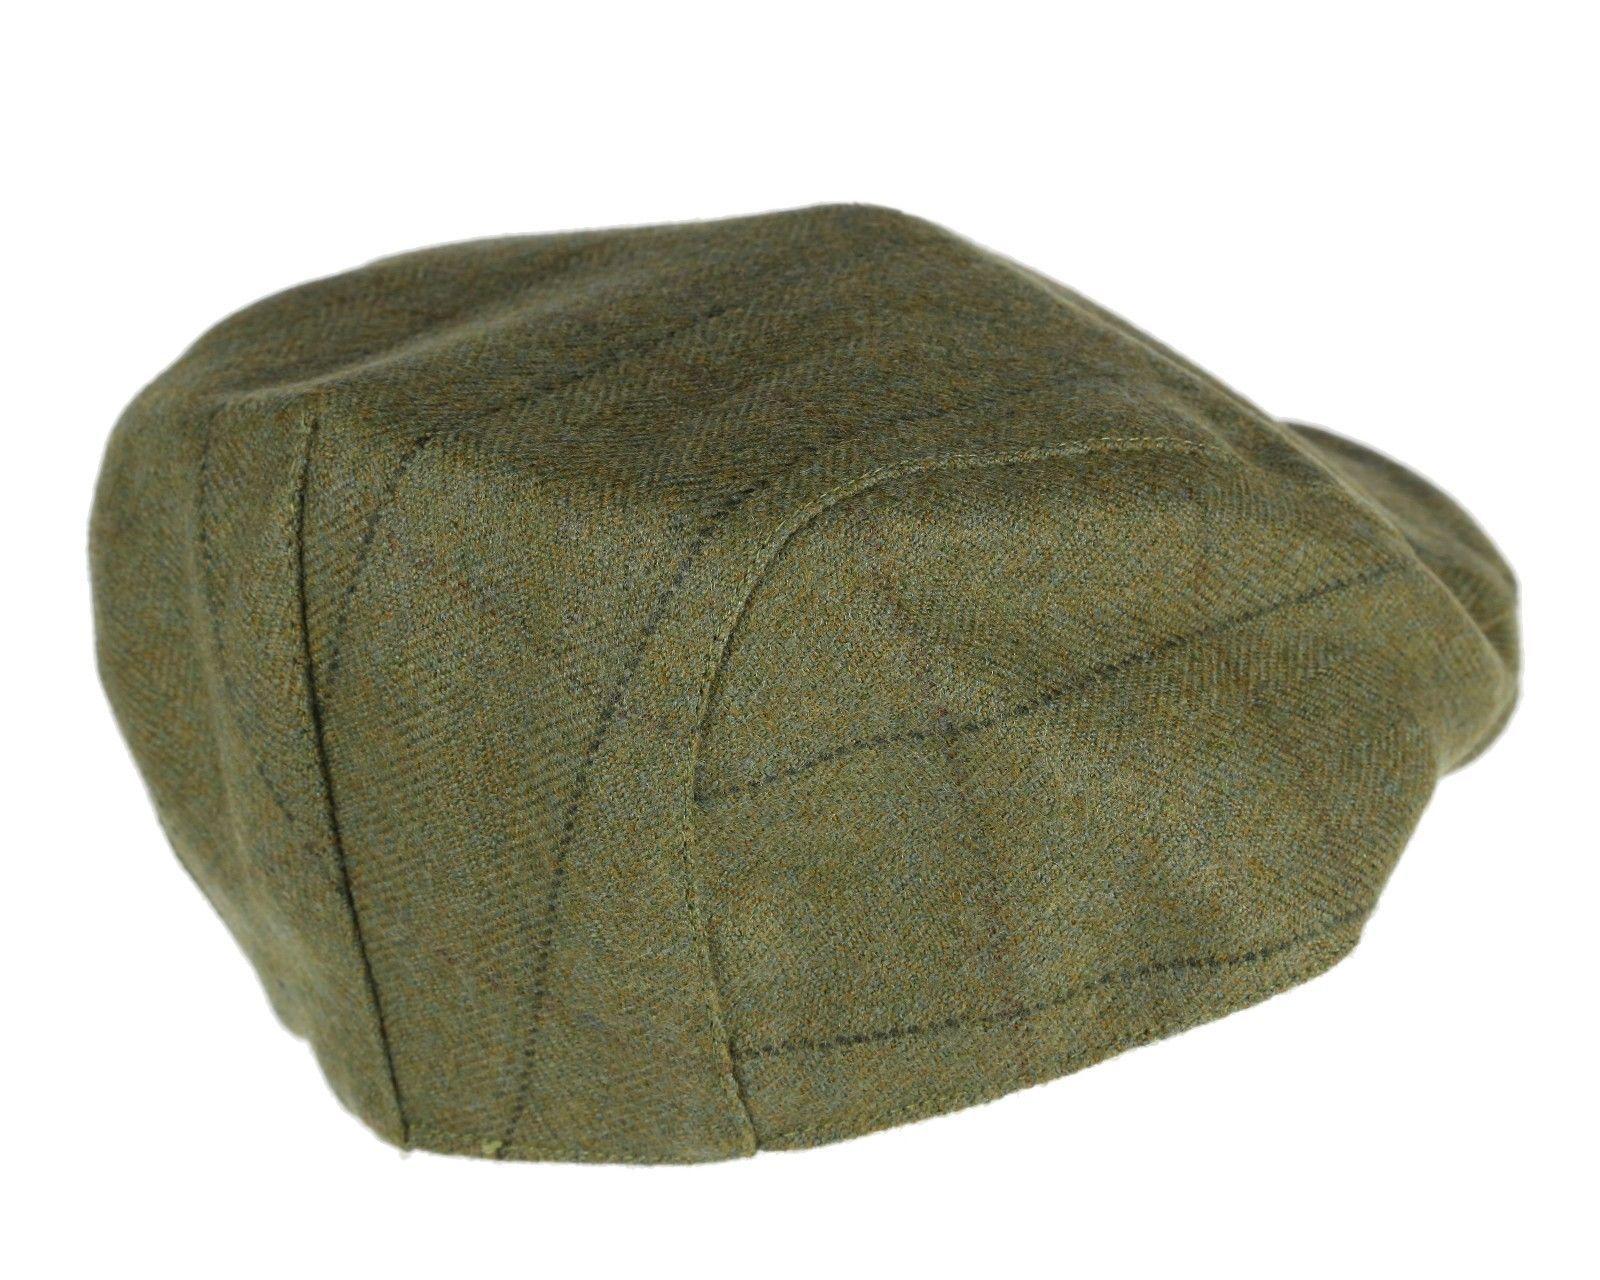 f64bb0ff023 Kensington Waterproof TWEED Flat Cap Traditional Country Hat Breathable New  Wool